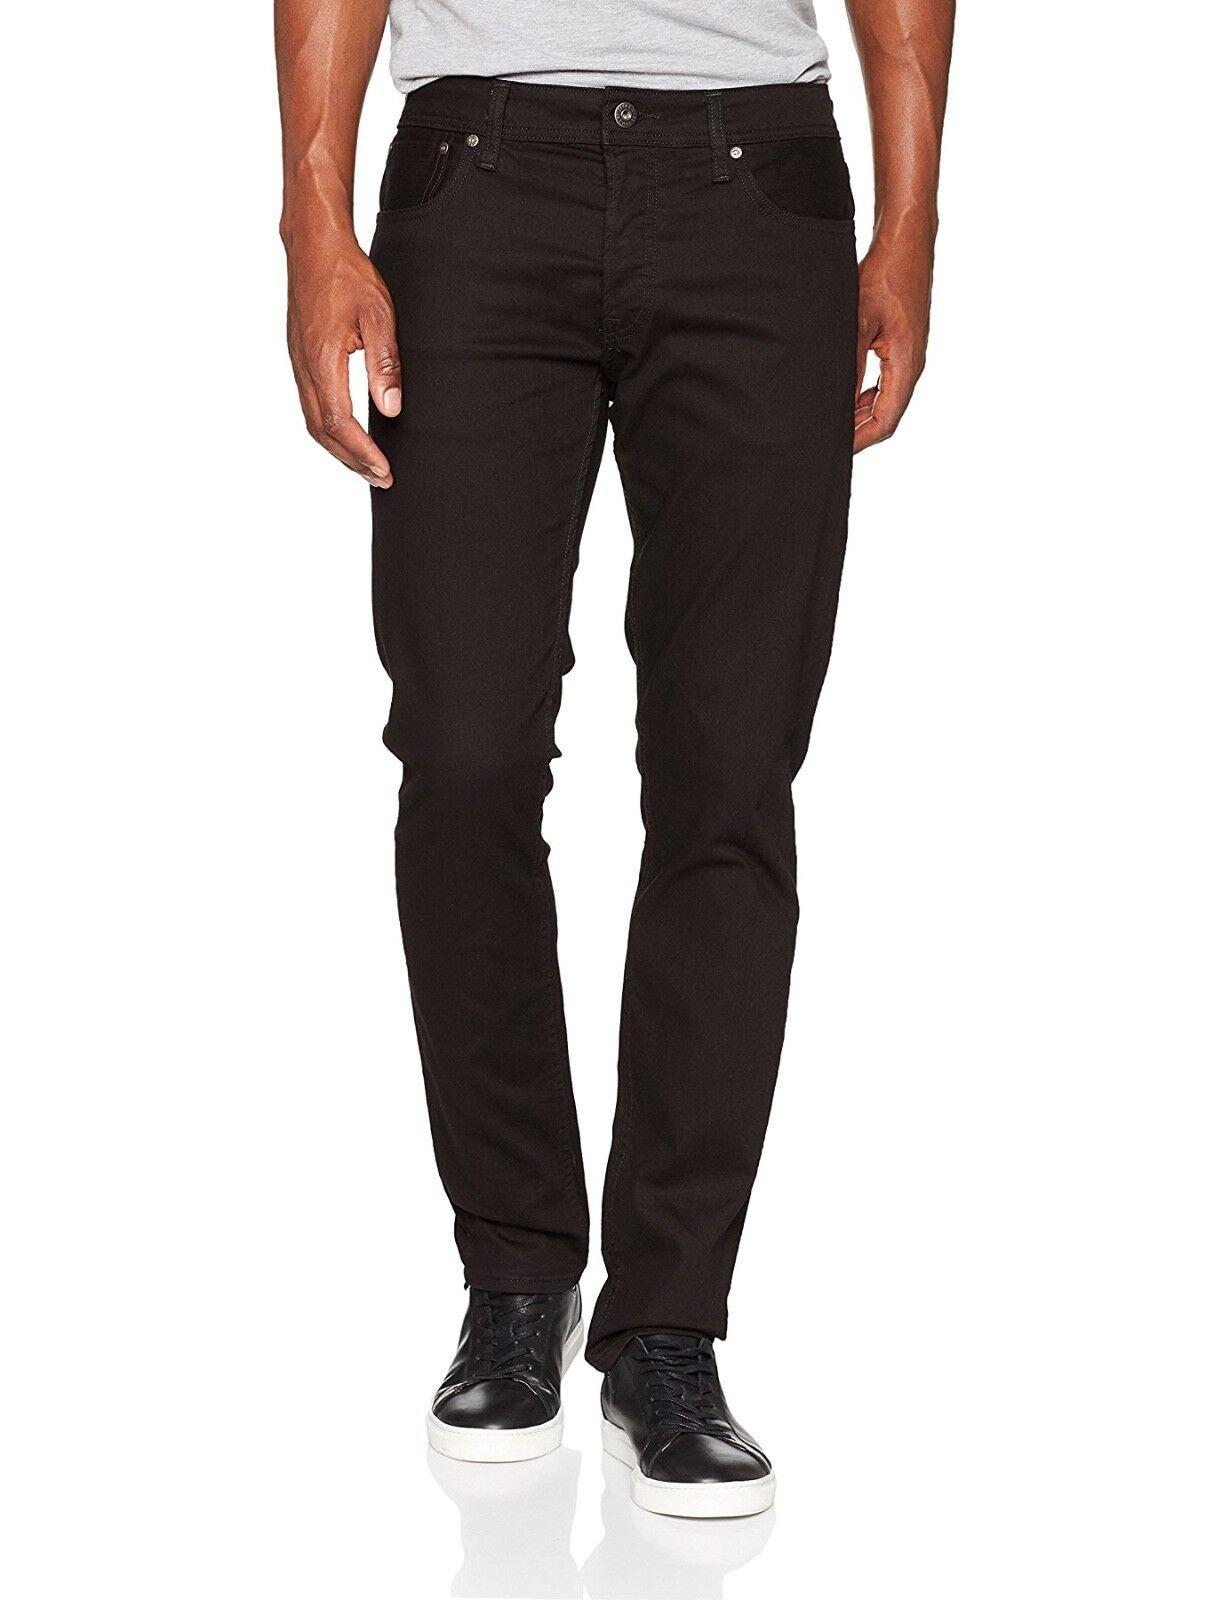 JACK & Jones Jeans Uomo TIM TIM TIM slim fit Stretto Gamba Affusolata Denim Pantaloni Nero Elasticizzato 2db804